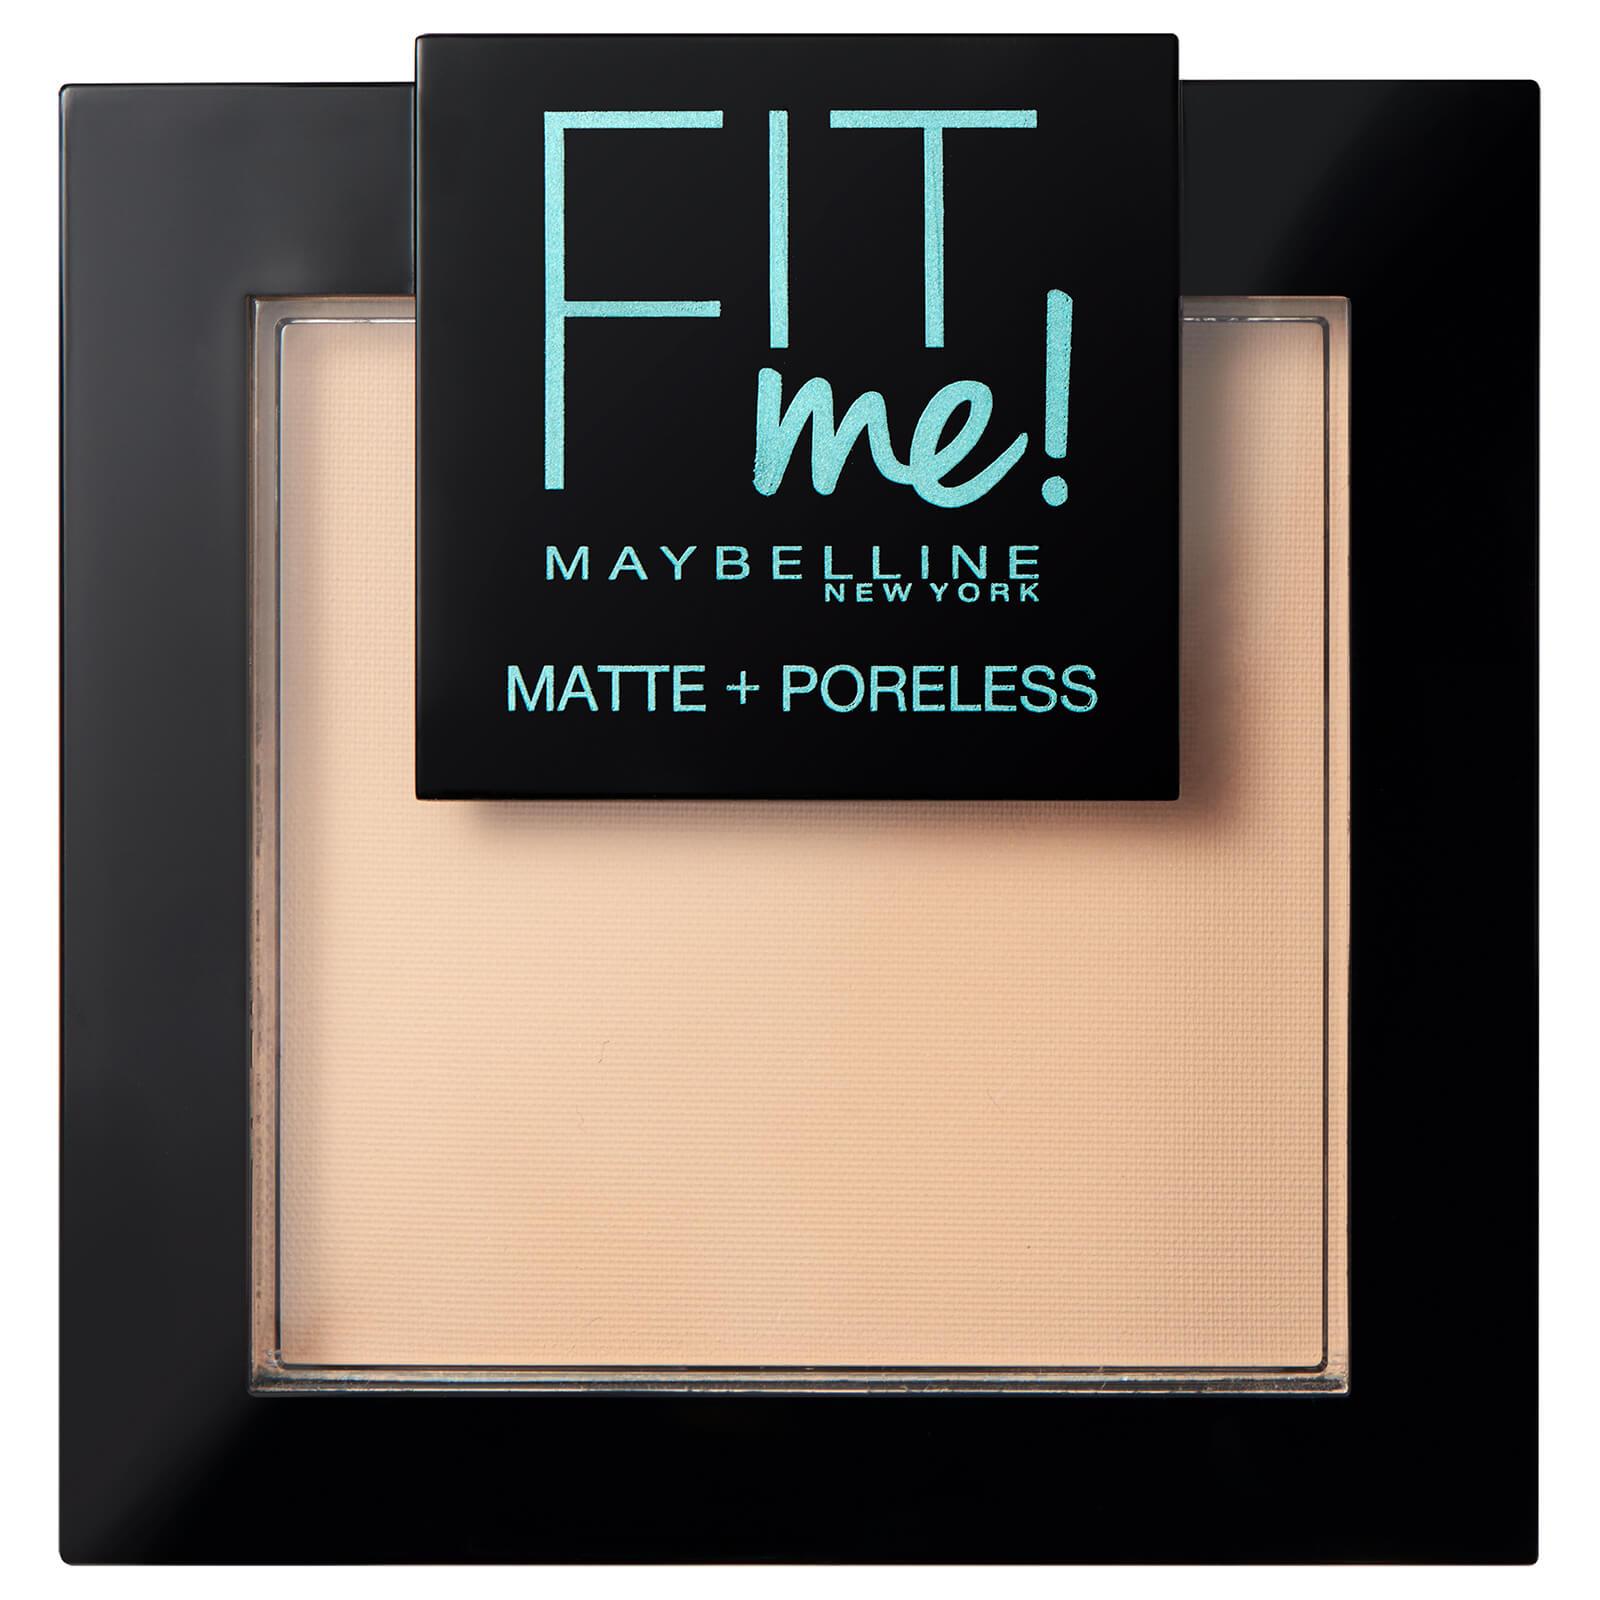 Купить Maybelline Fit Me! Matte and Poreless Powder 9g (Various Shades) - 110 Porcelain